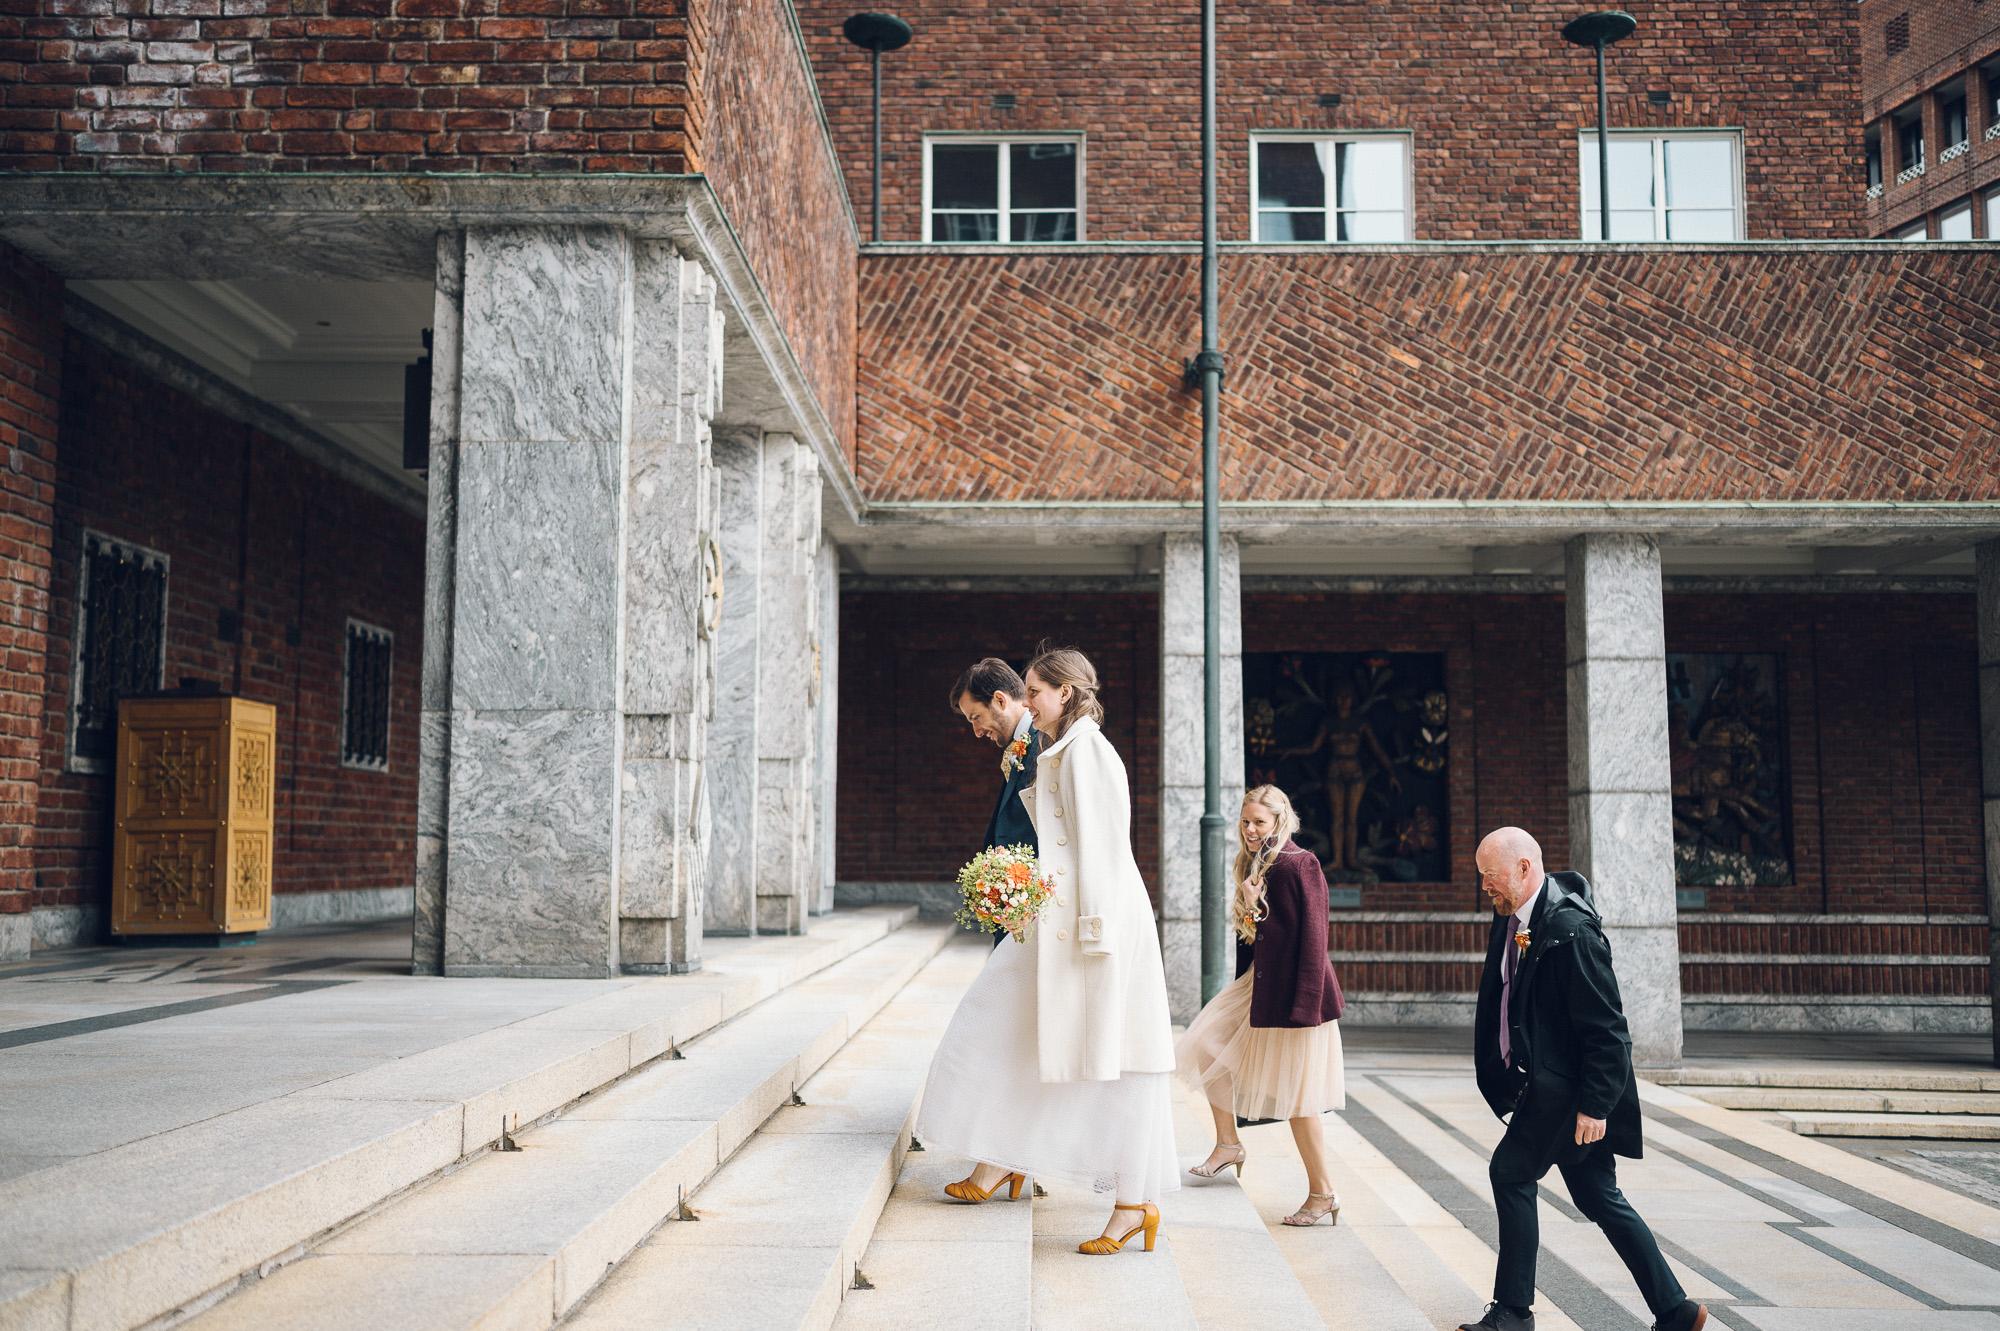 Bryllupsfoto av brud og brudgom som går opp trappa på rådhuset.